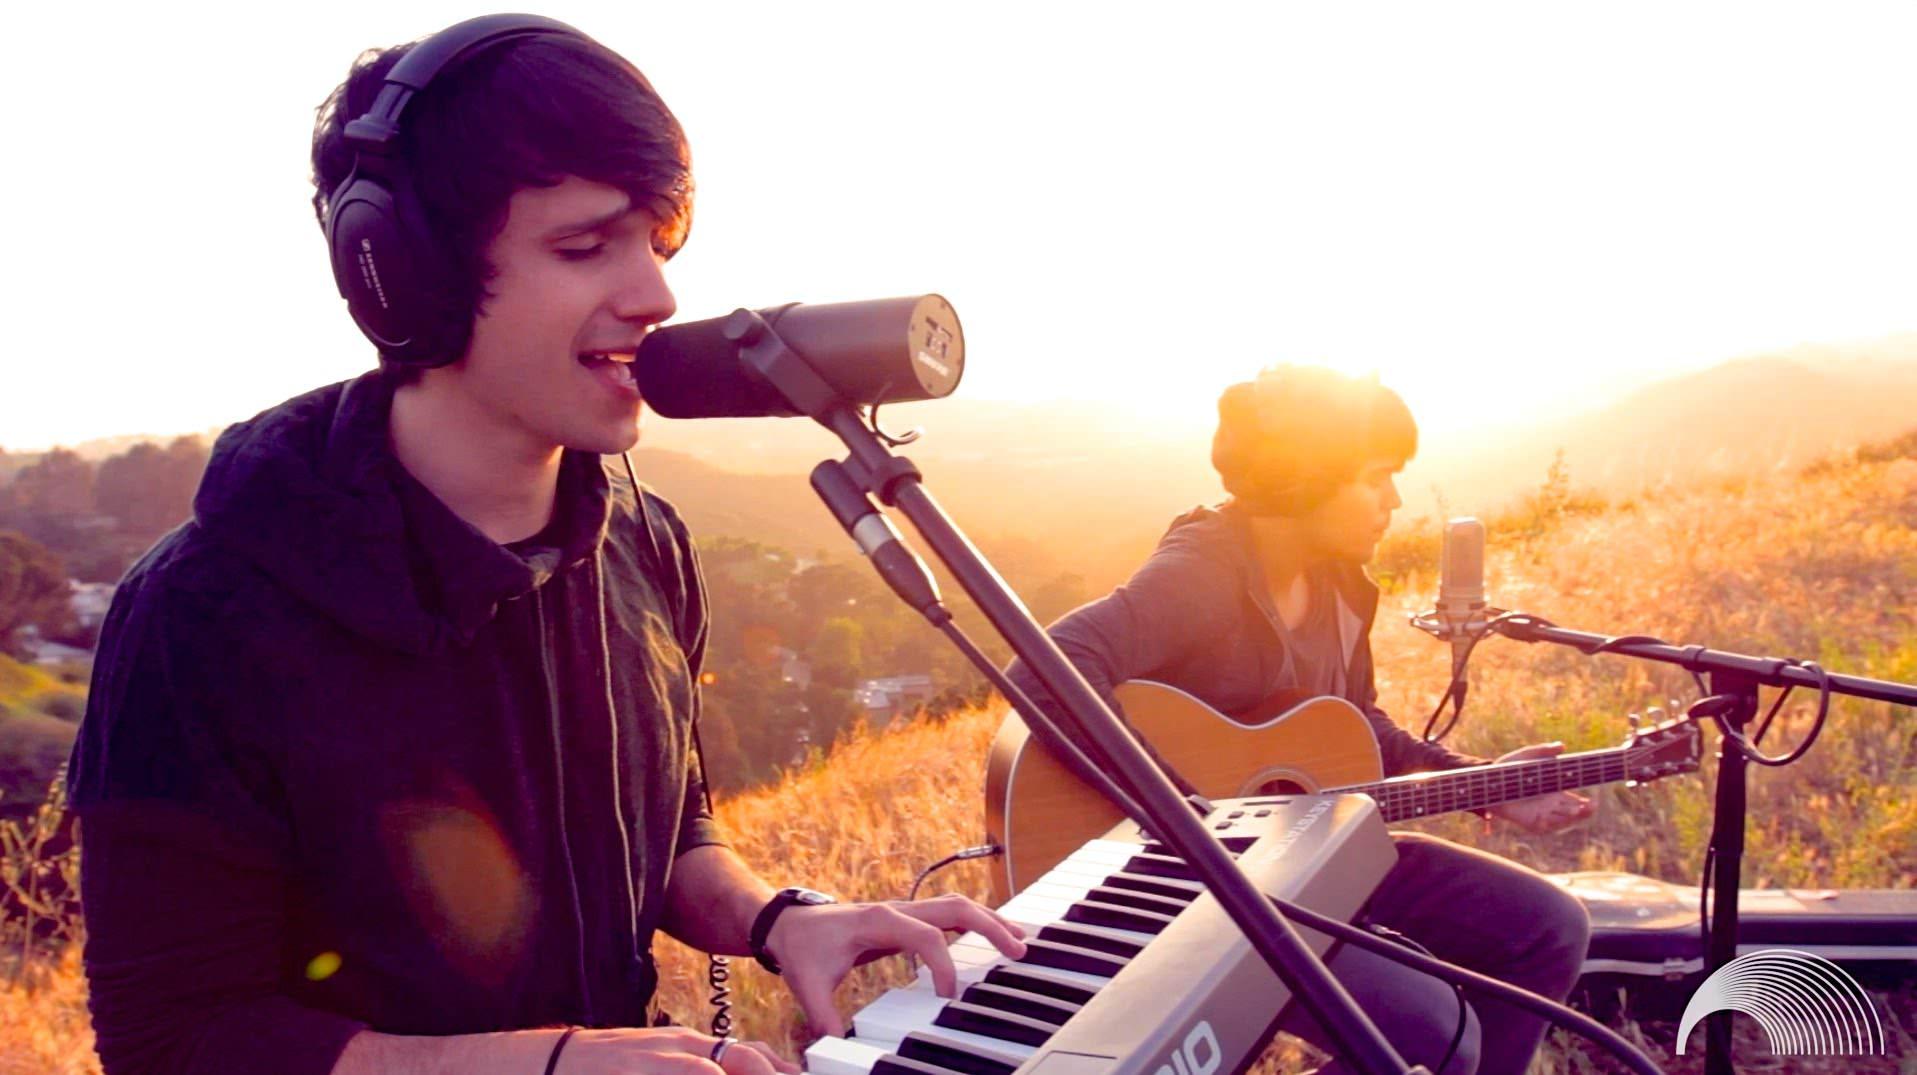 Future Sunsets - Make Money as a Musician Online